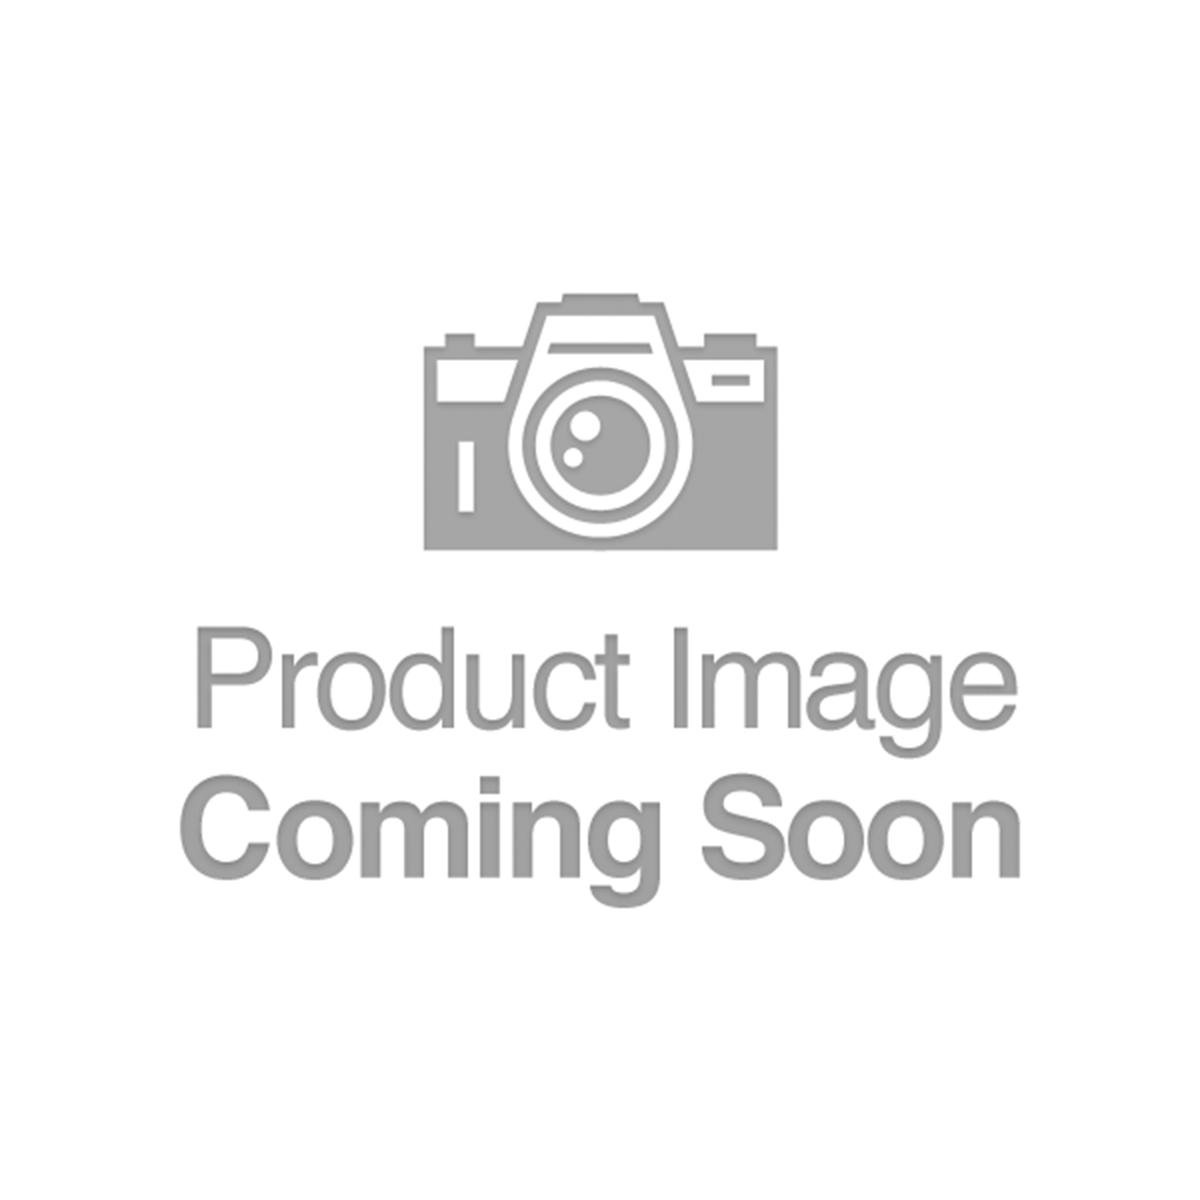 FR 248 $2 1896 Silver Certificate PMG 65 EPQ